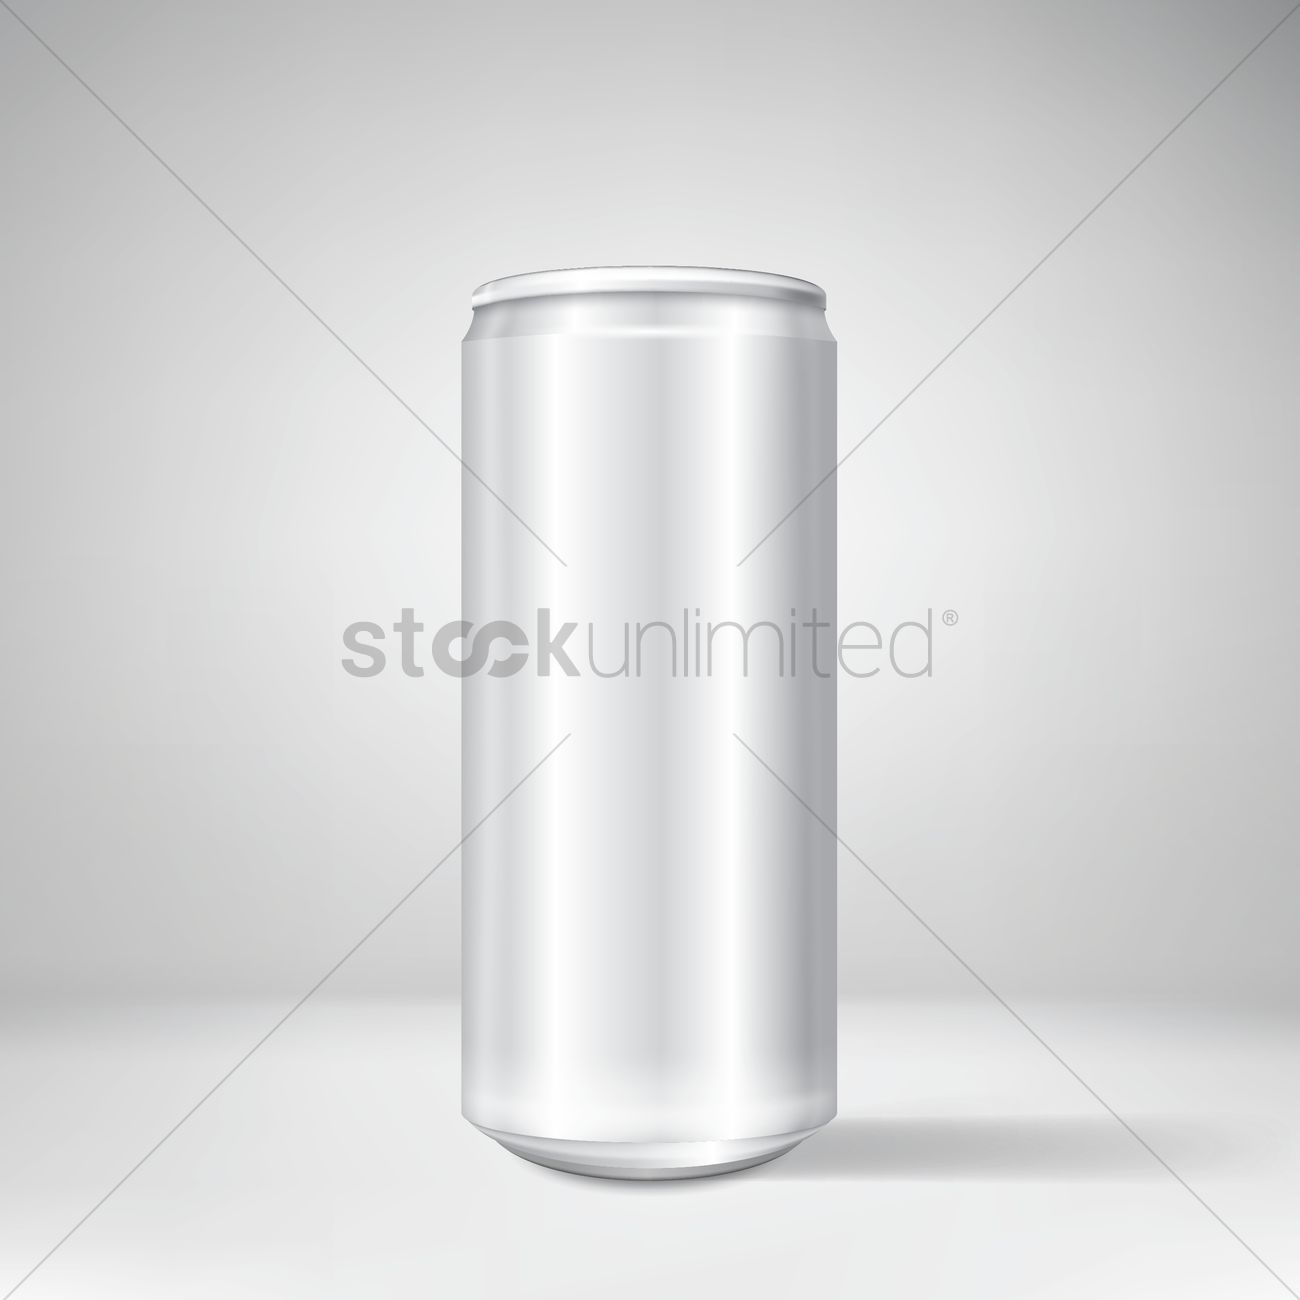 1300x1300 Aluminum Can Vector Image